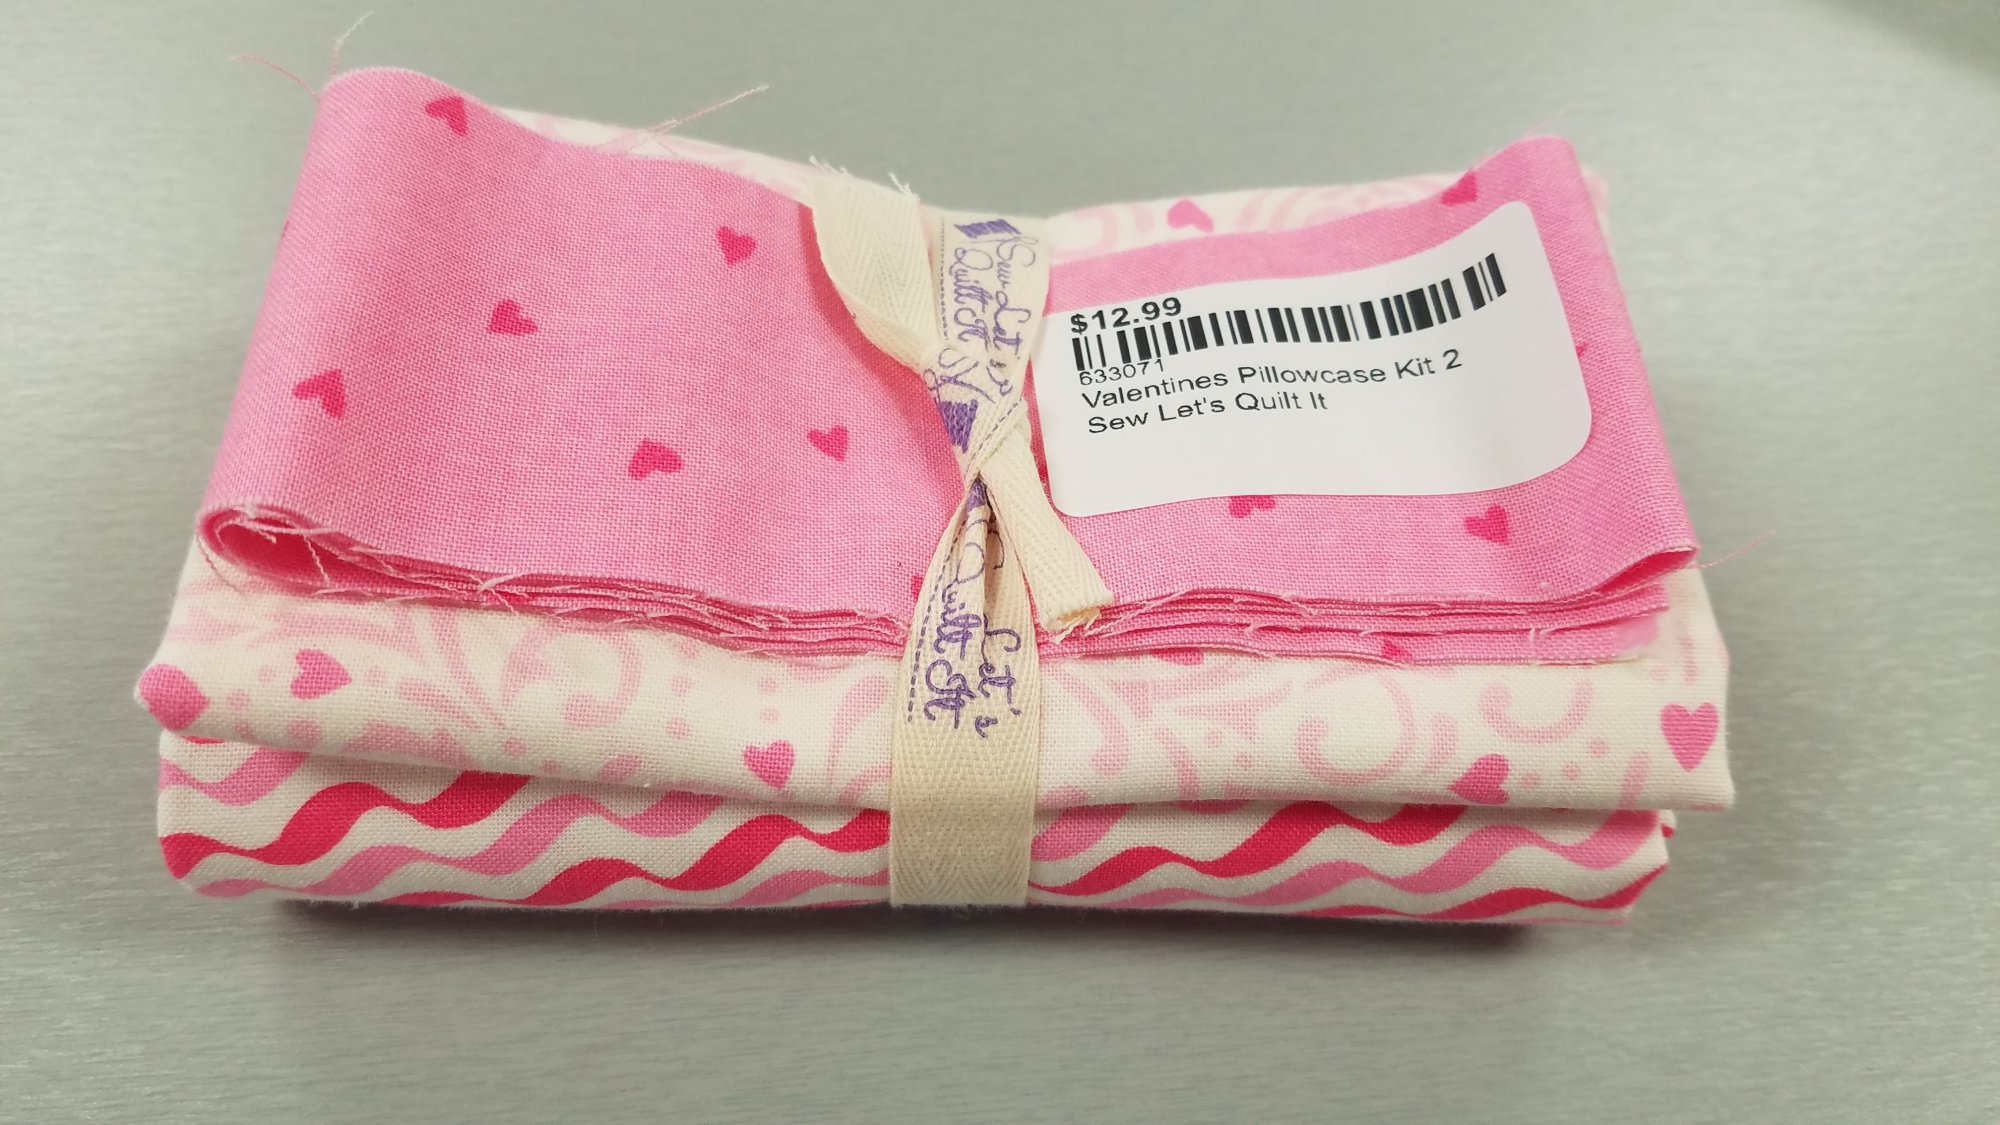 Valentines Pillowcase Kit 2